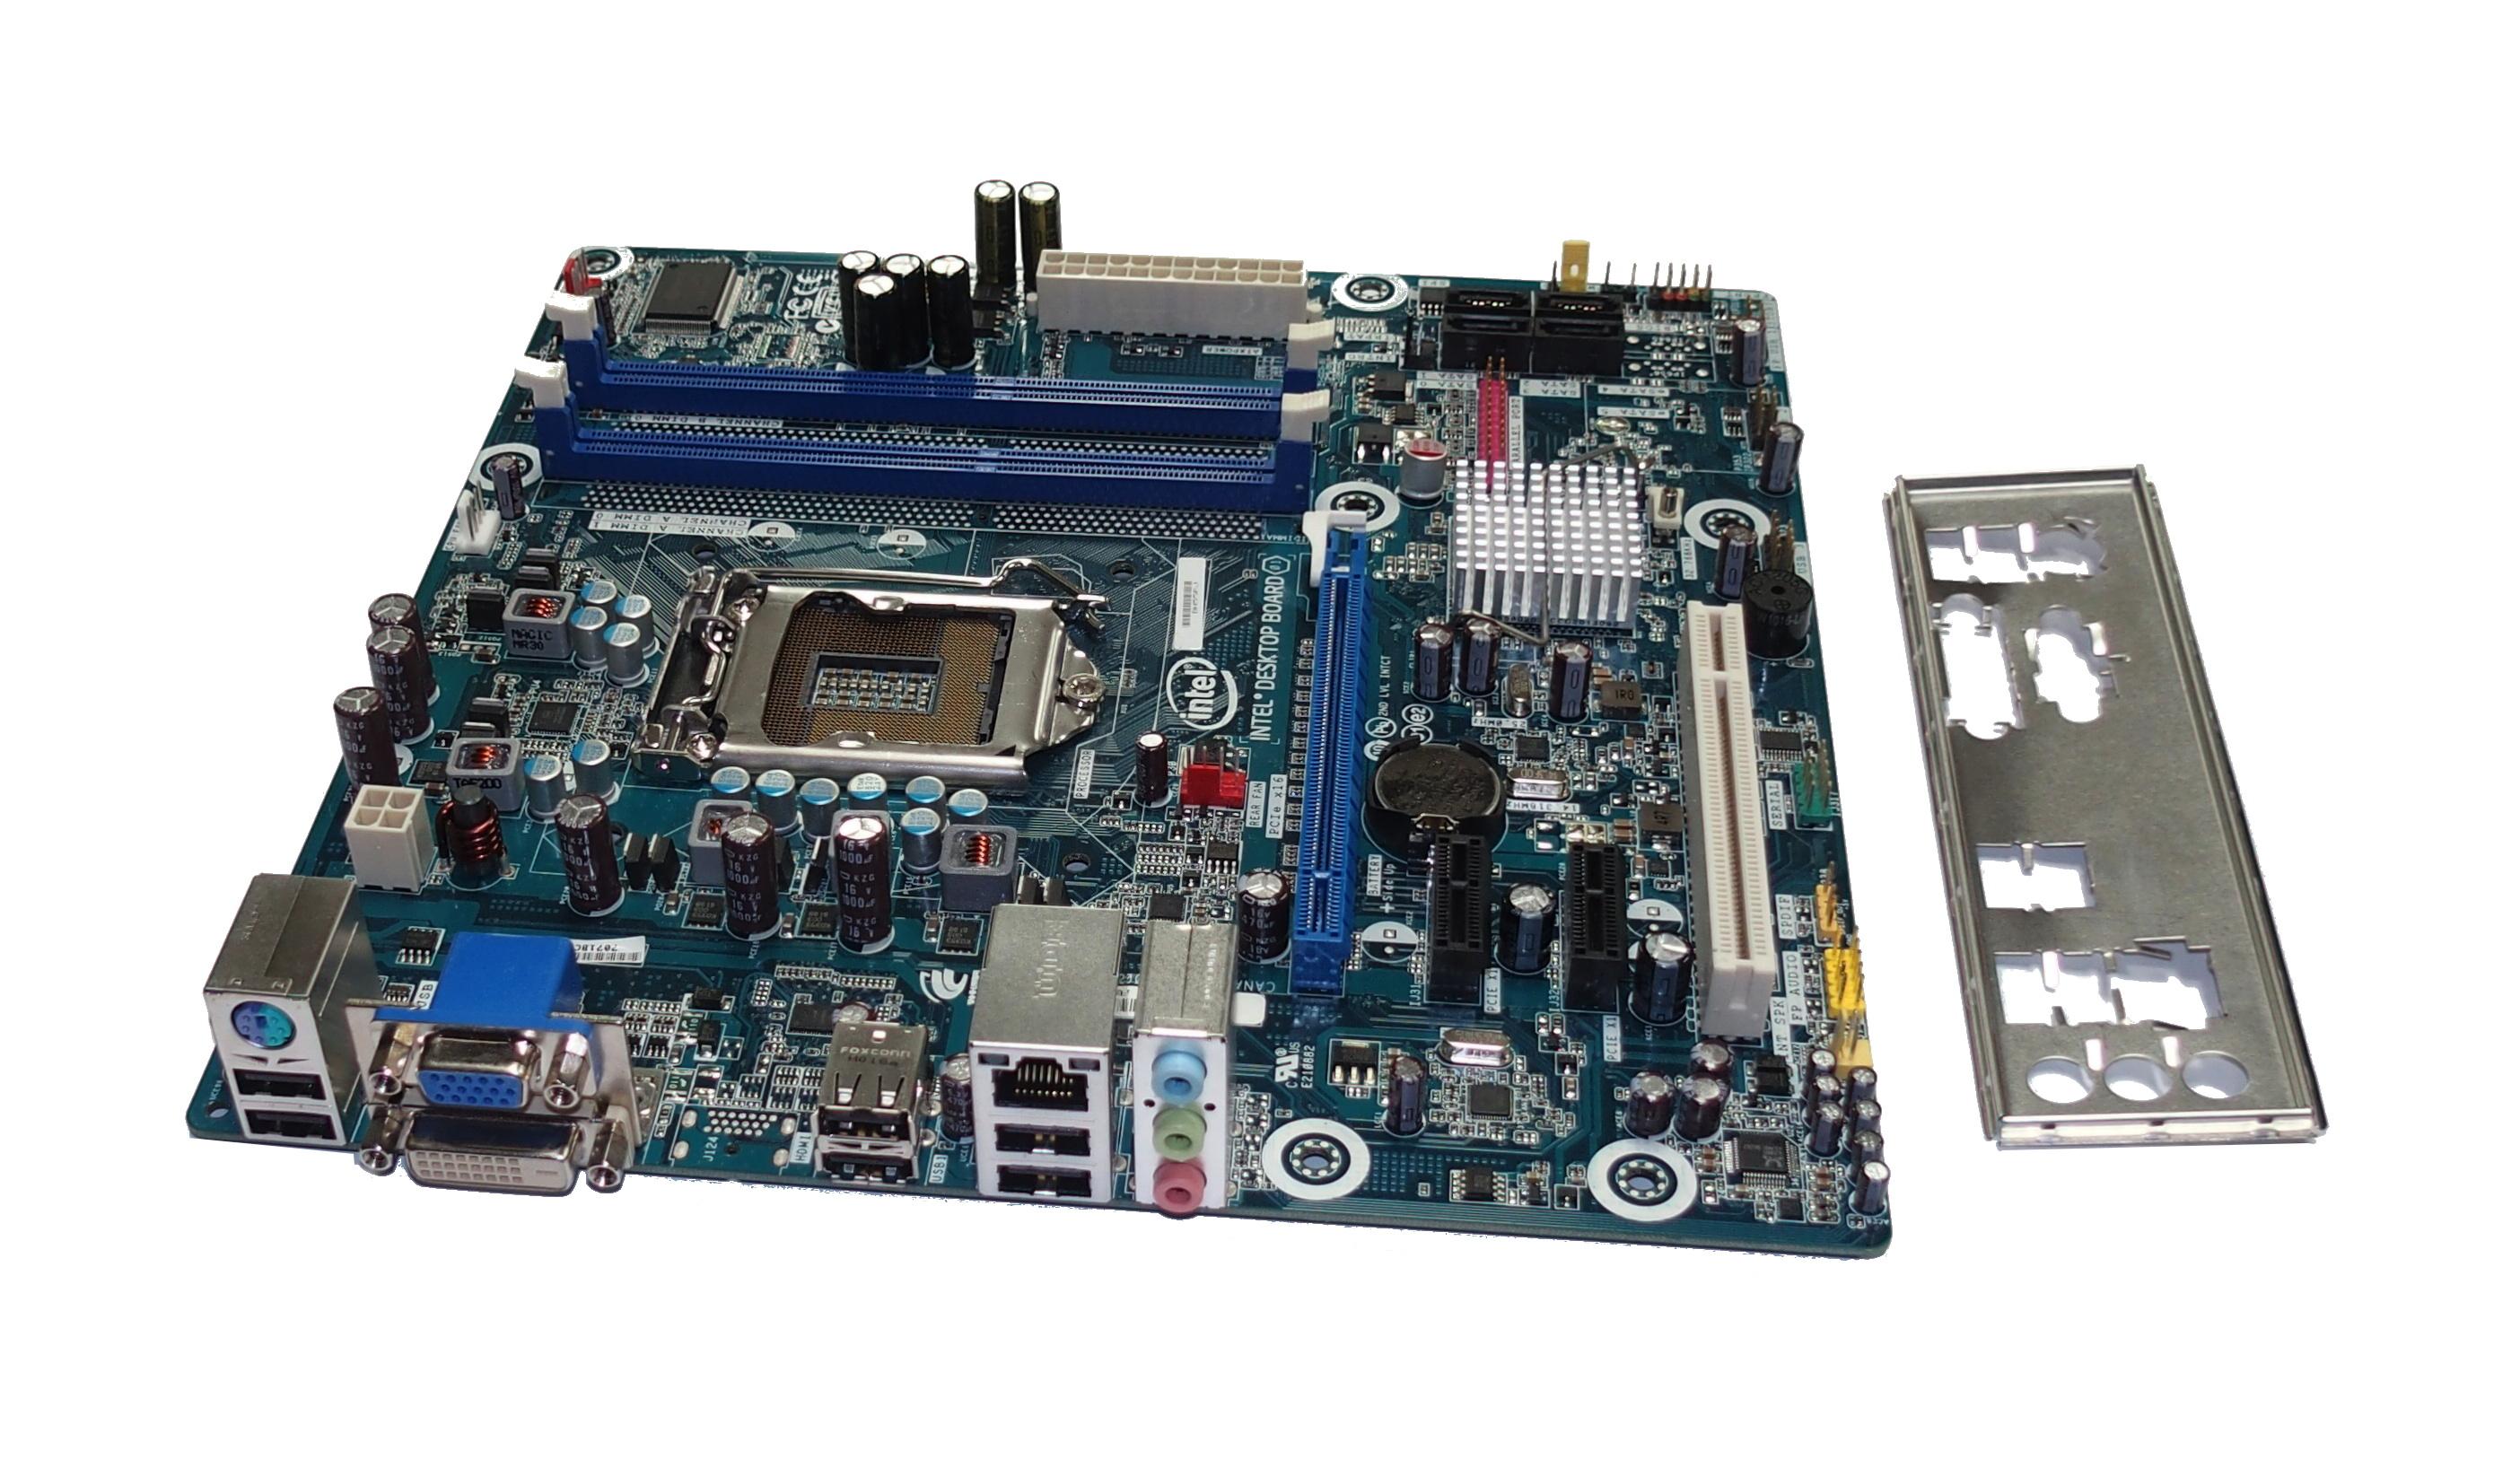 Intel E93812-301 DH55PJ Socket LGA1156 Desktop Motherboard